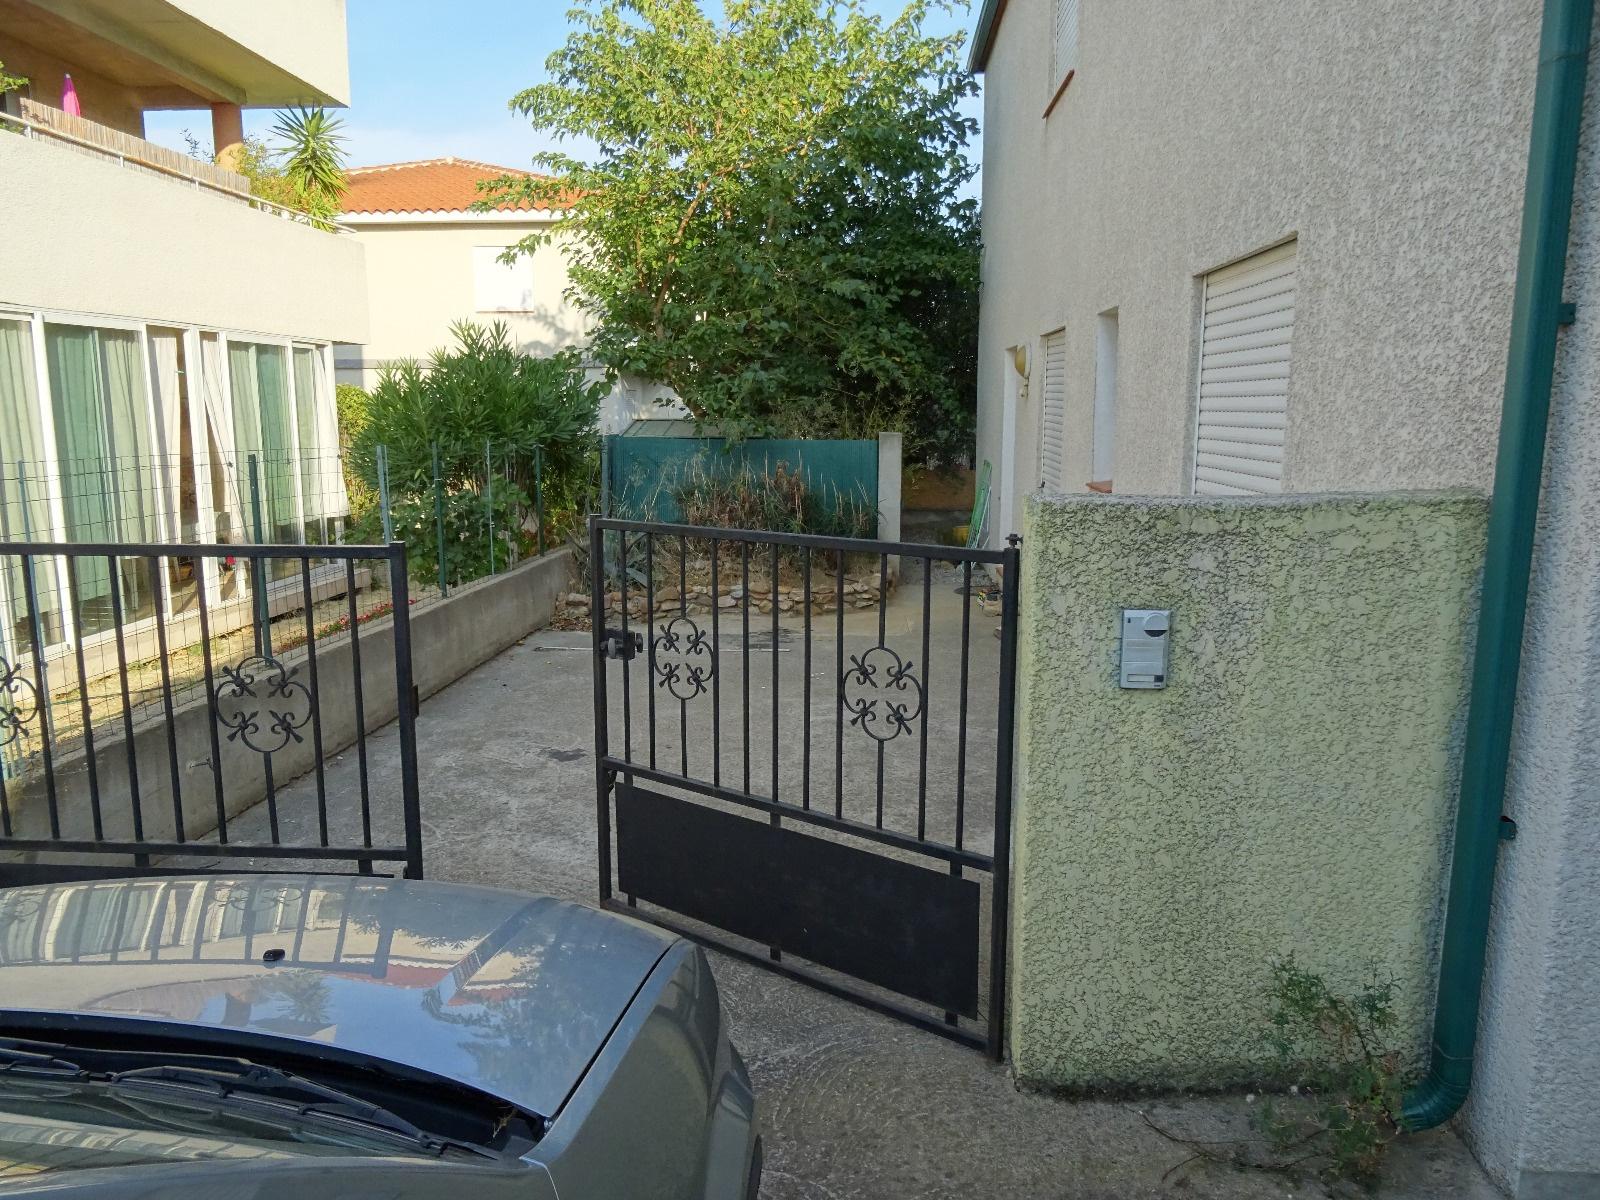 Vente appartement t3 rdc jardin perpignan sud - Jardin en pente photos perpignan ...